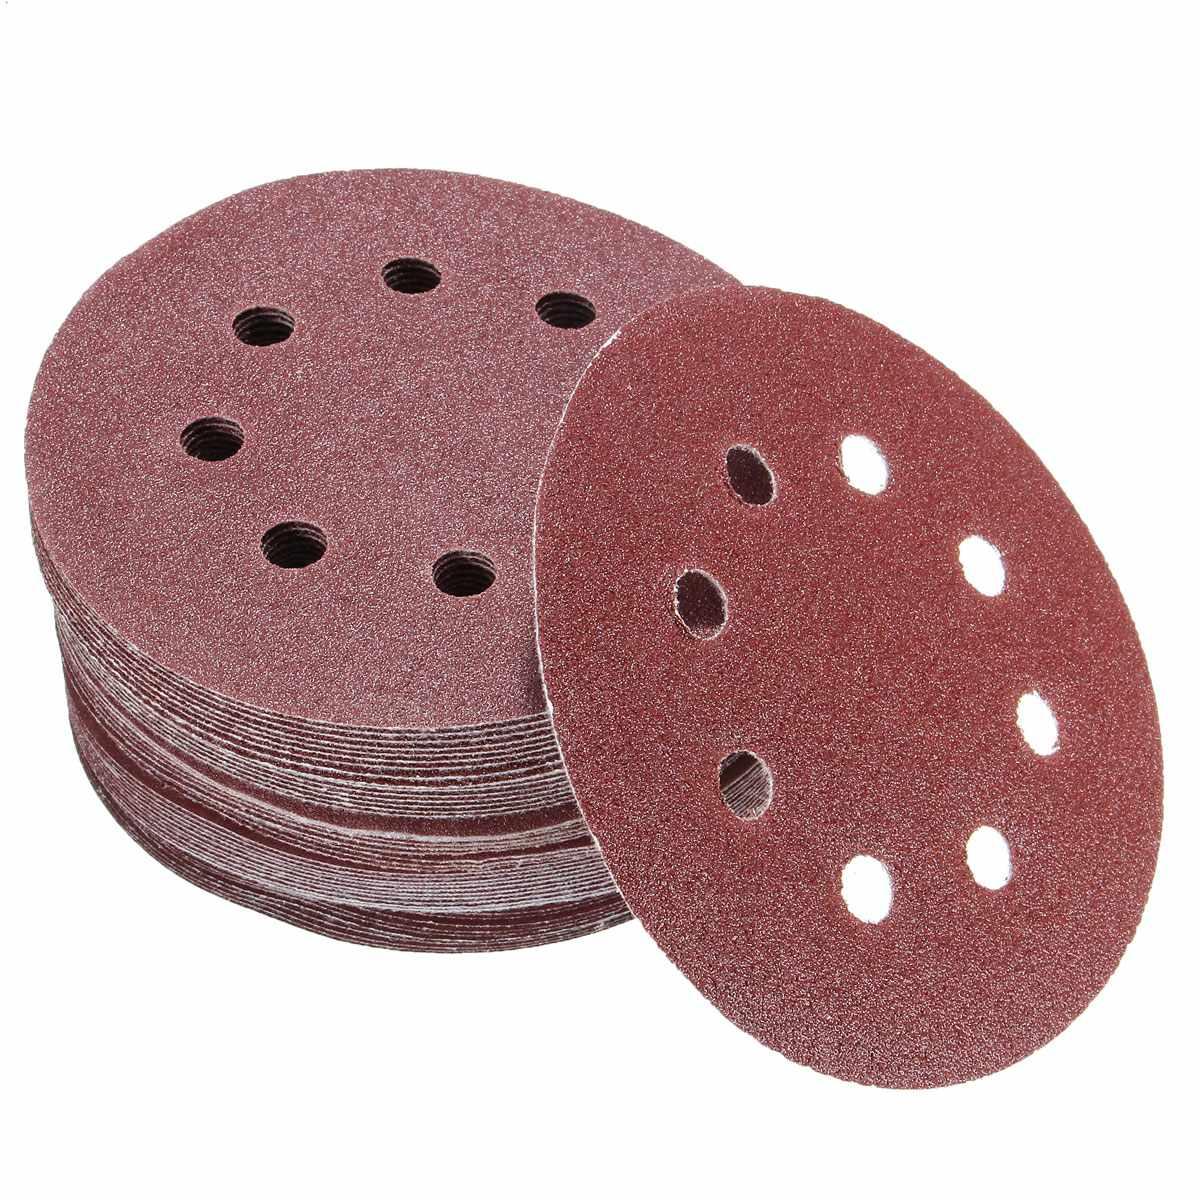 facial-sanding-discs